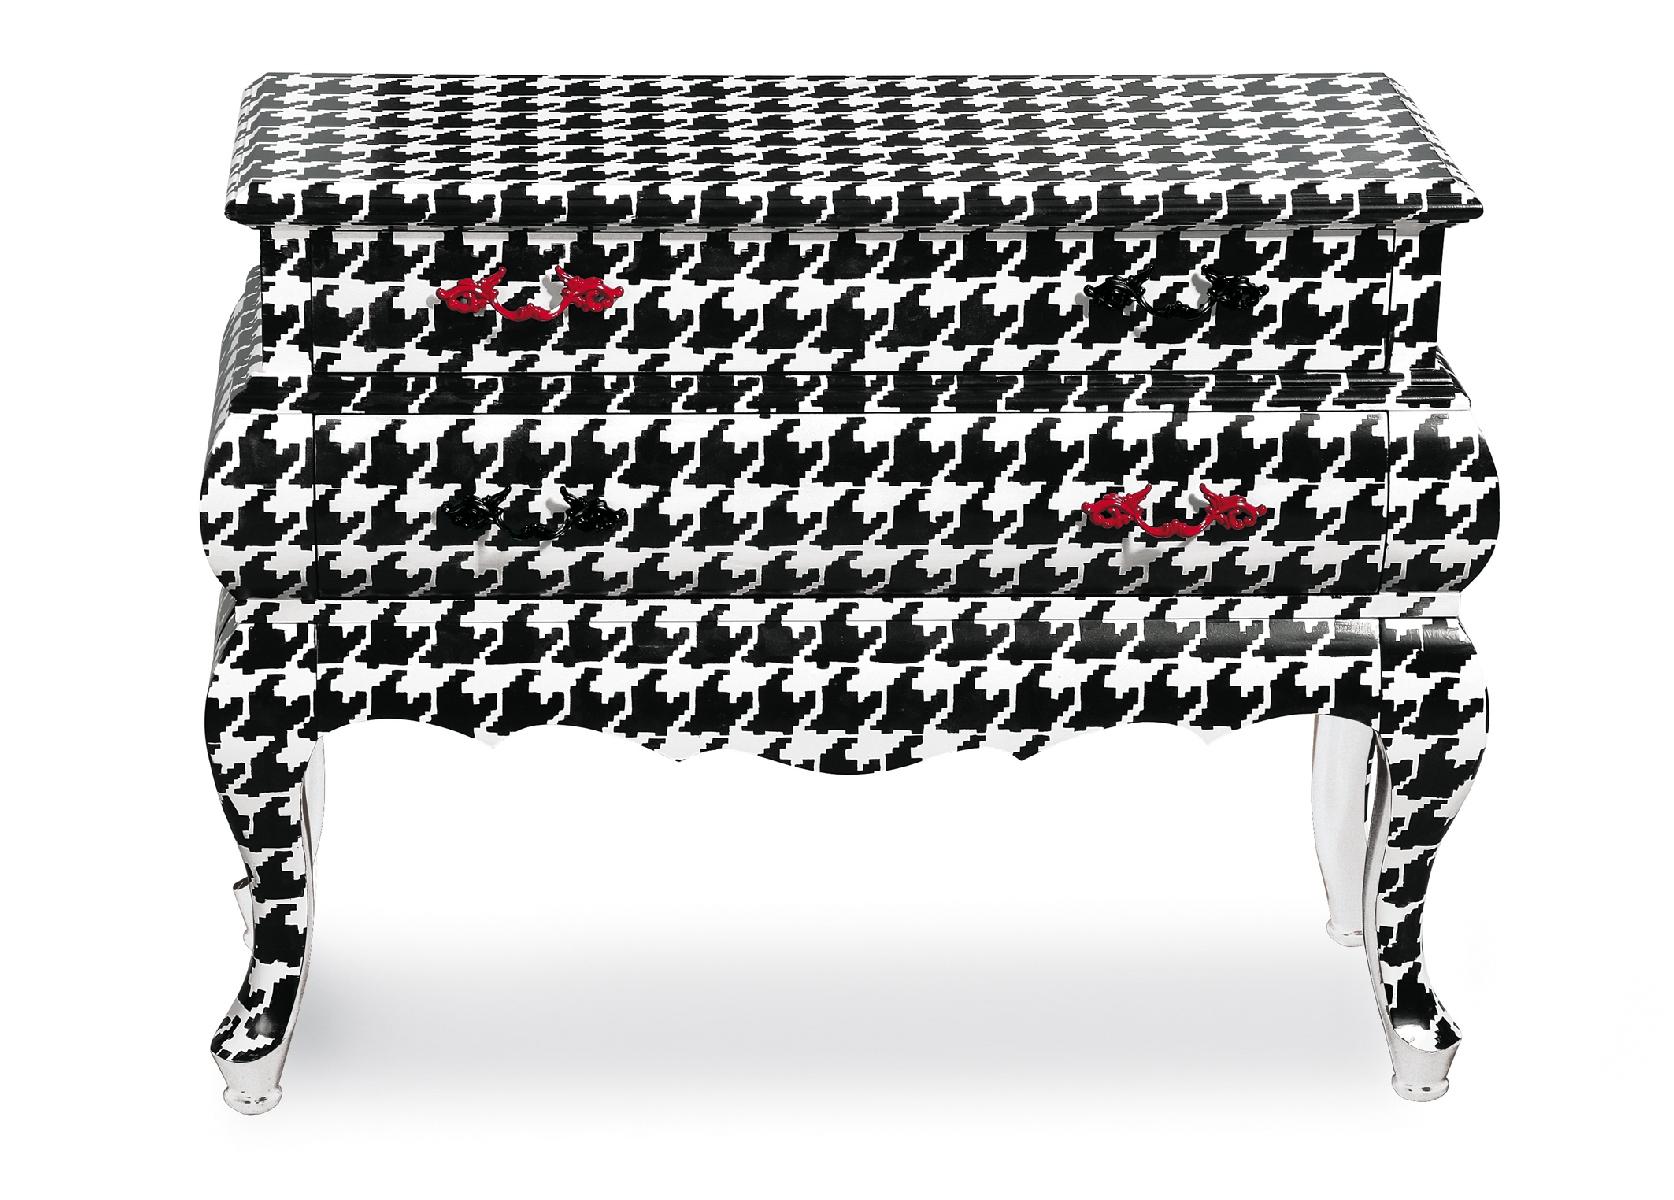 seletti_the-trip-furniture_001-0